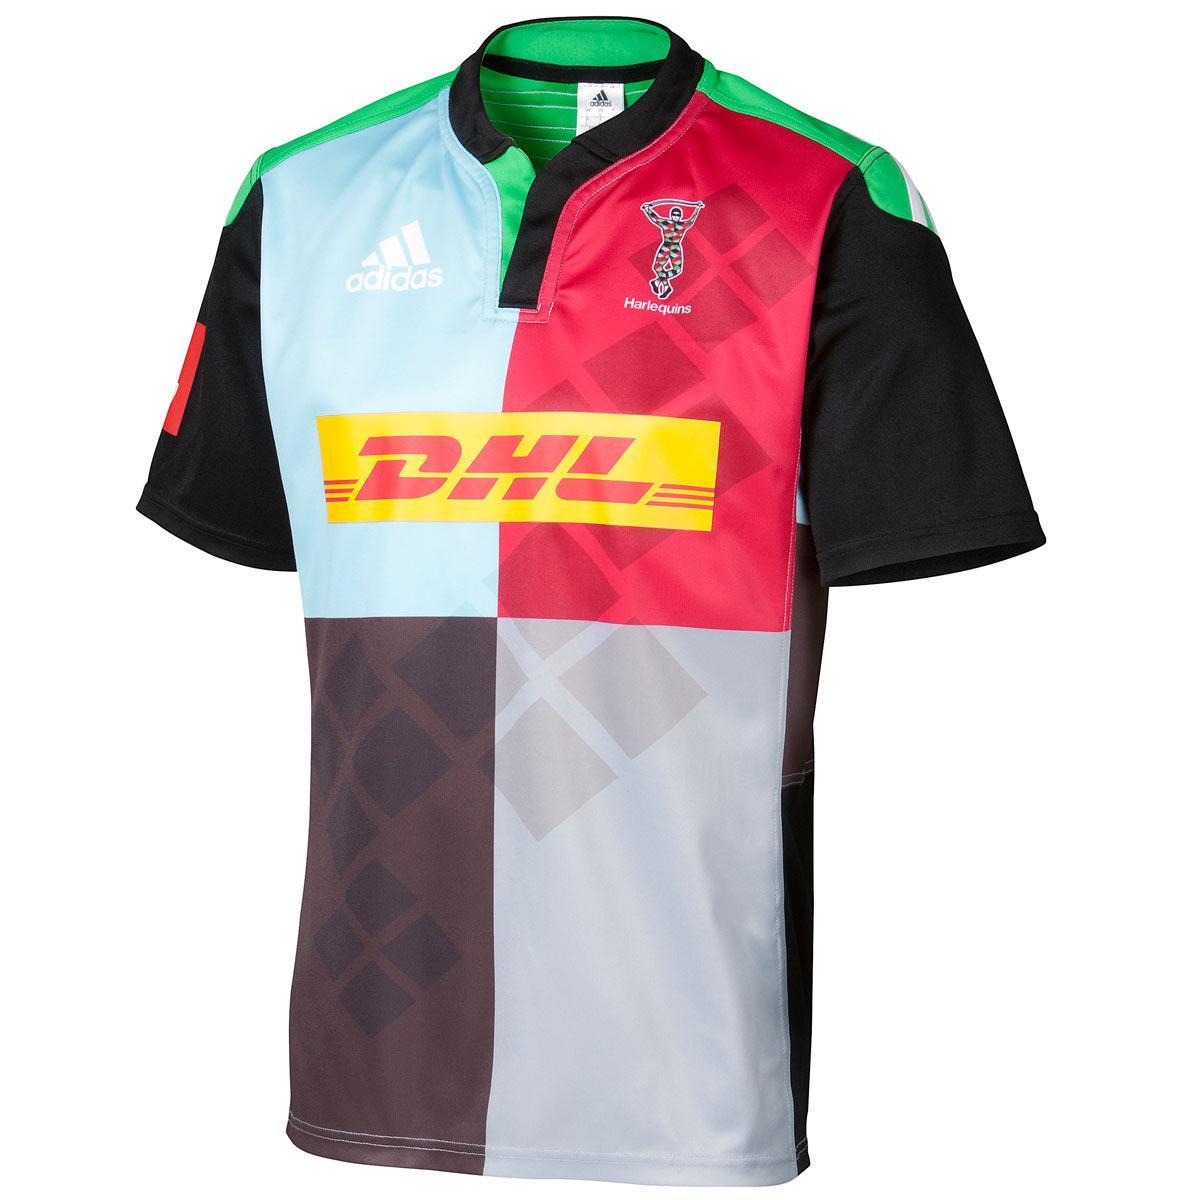 Adidas Rugby Home: Harlequins 2014/15 Adidas Home & Alternate Shirts